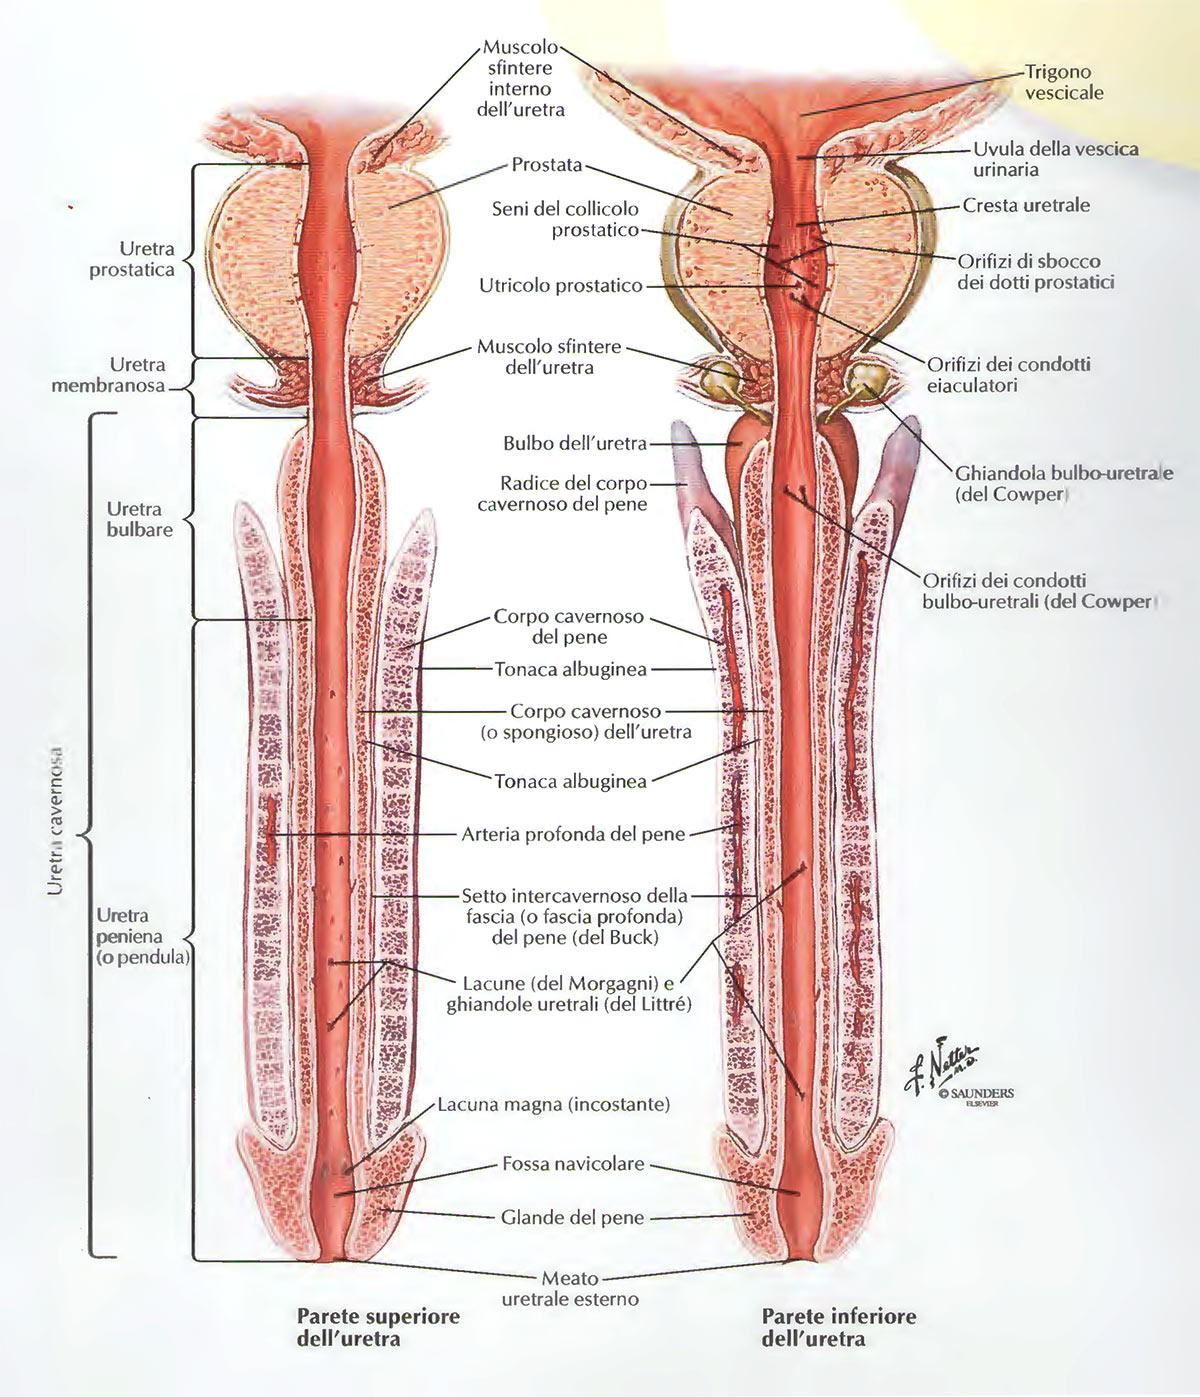 Uretra parte superiore e parte inferiore